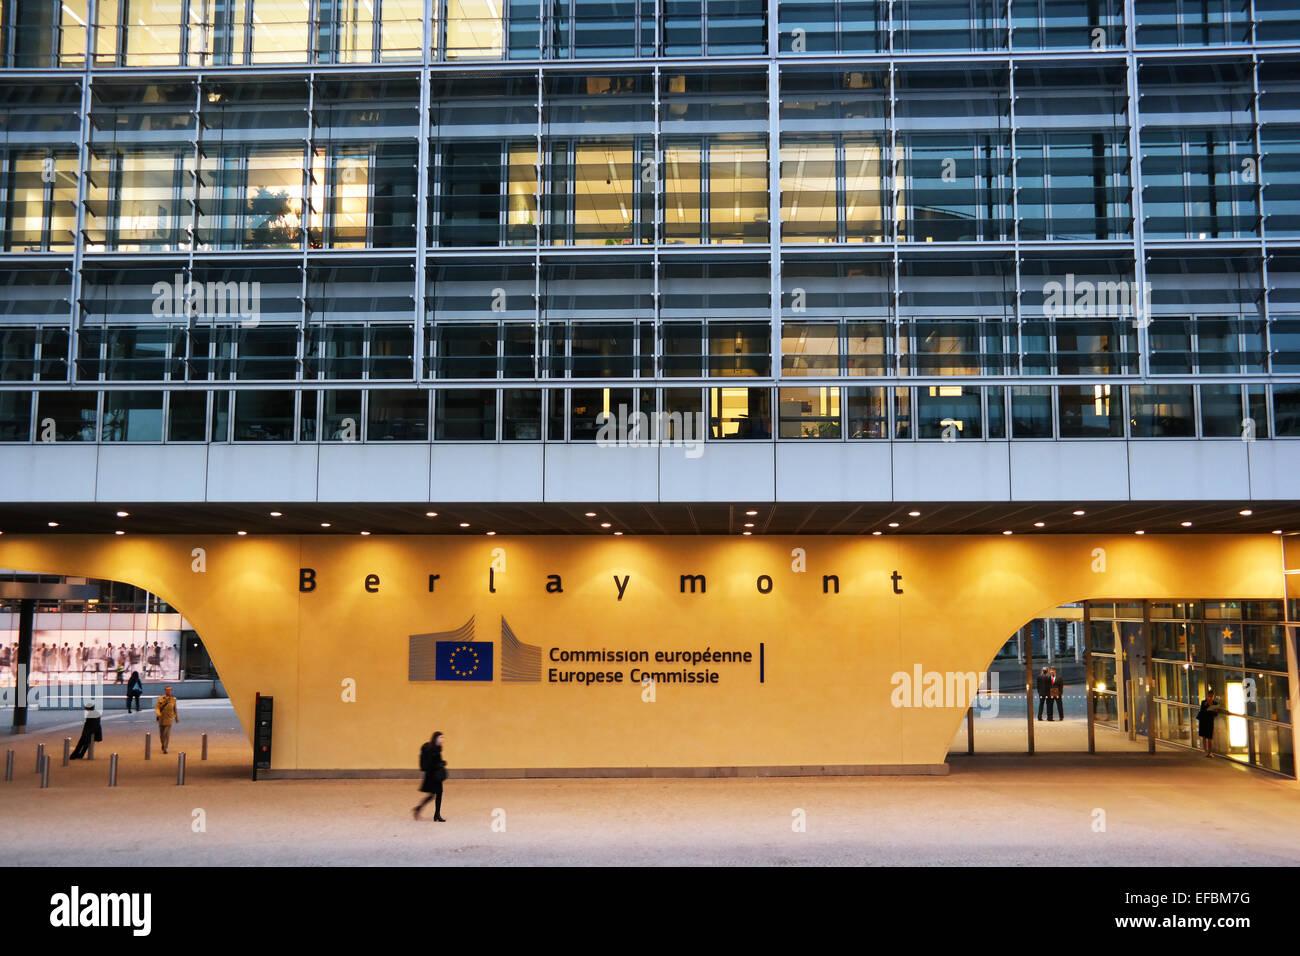 BRUSSELS, BELGIUM - OCTOBER 2014:  Berlaymont the European commission building during dusk - Stock Image